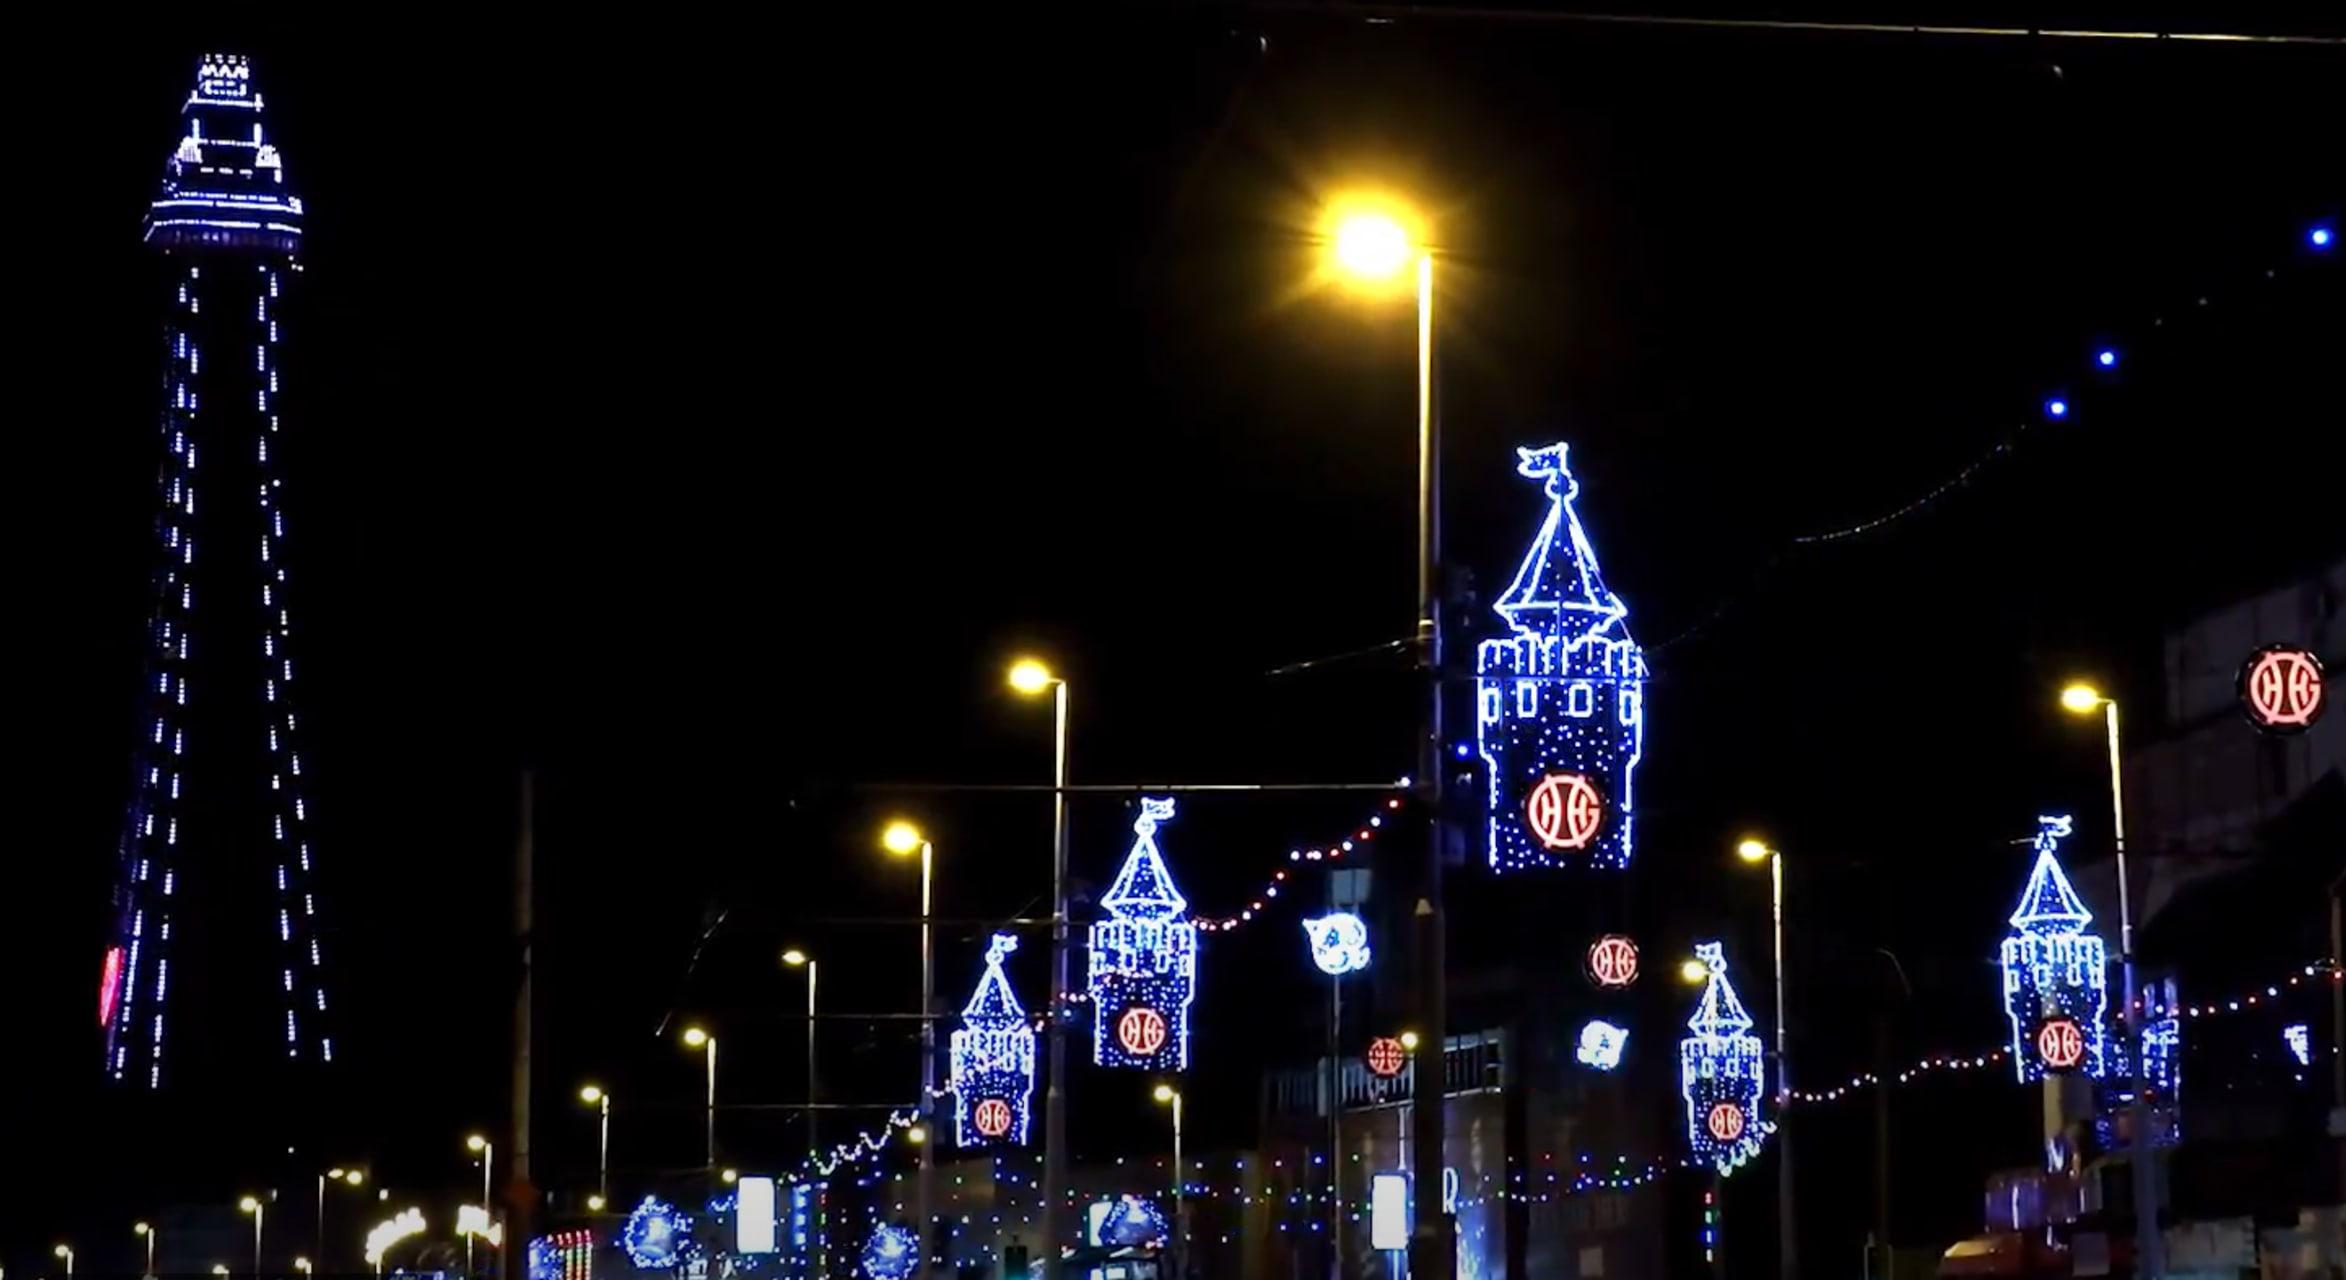 Blackpool - A Walk Through the Lights - Experience the Magic of Blackpool Illuminations